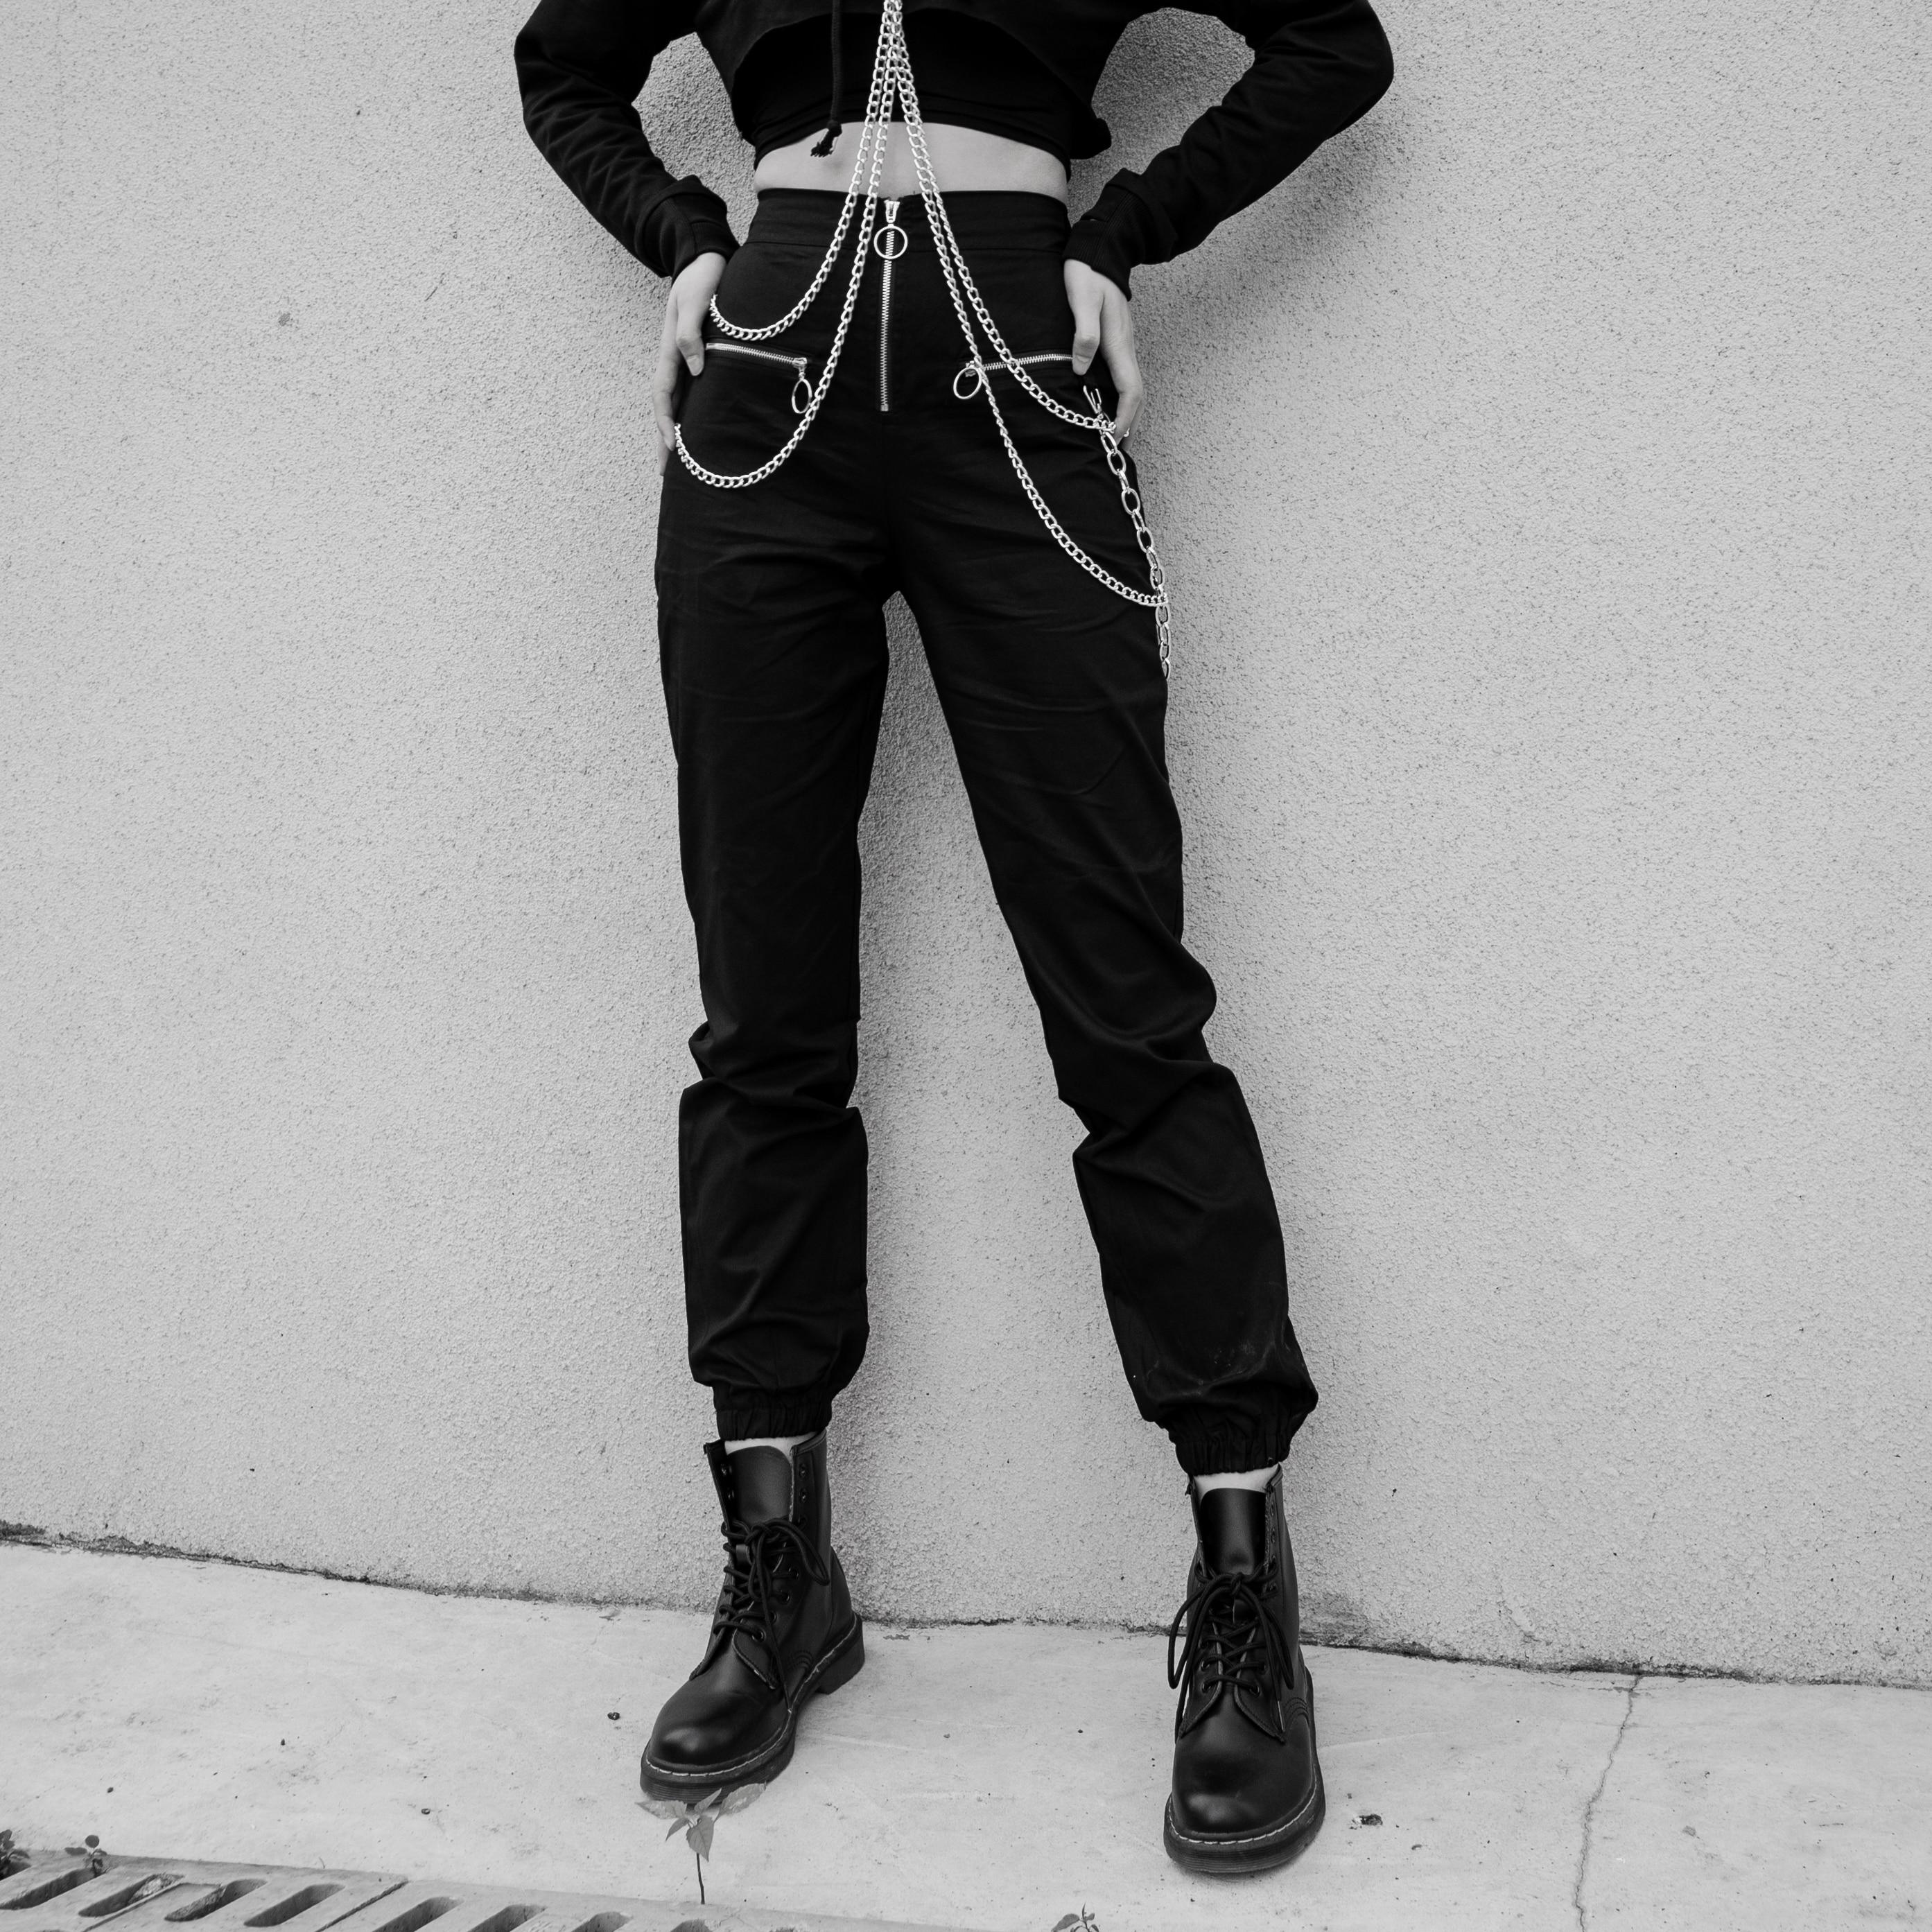 Gothic Black Women Multiple Pocket Chain Fake Zippers Harem Pants 2019 Winter Goth Punk Streetwear Female Dark Loose Harem Pants